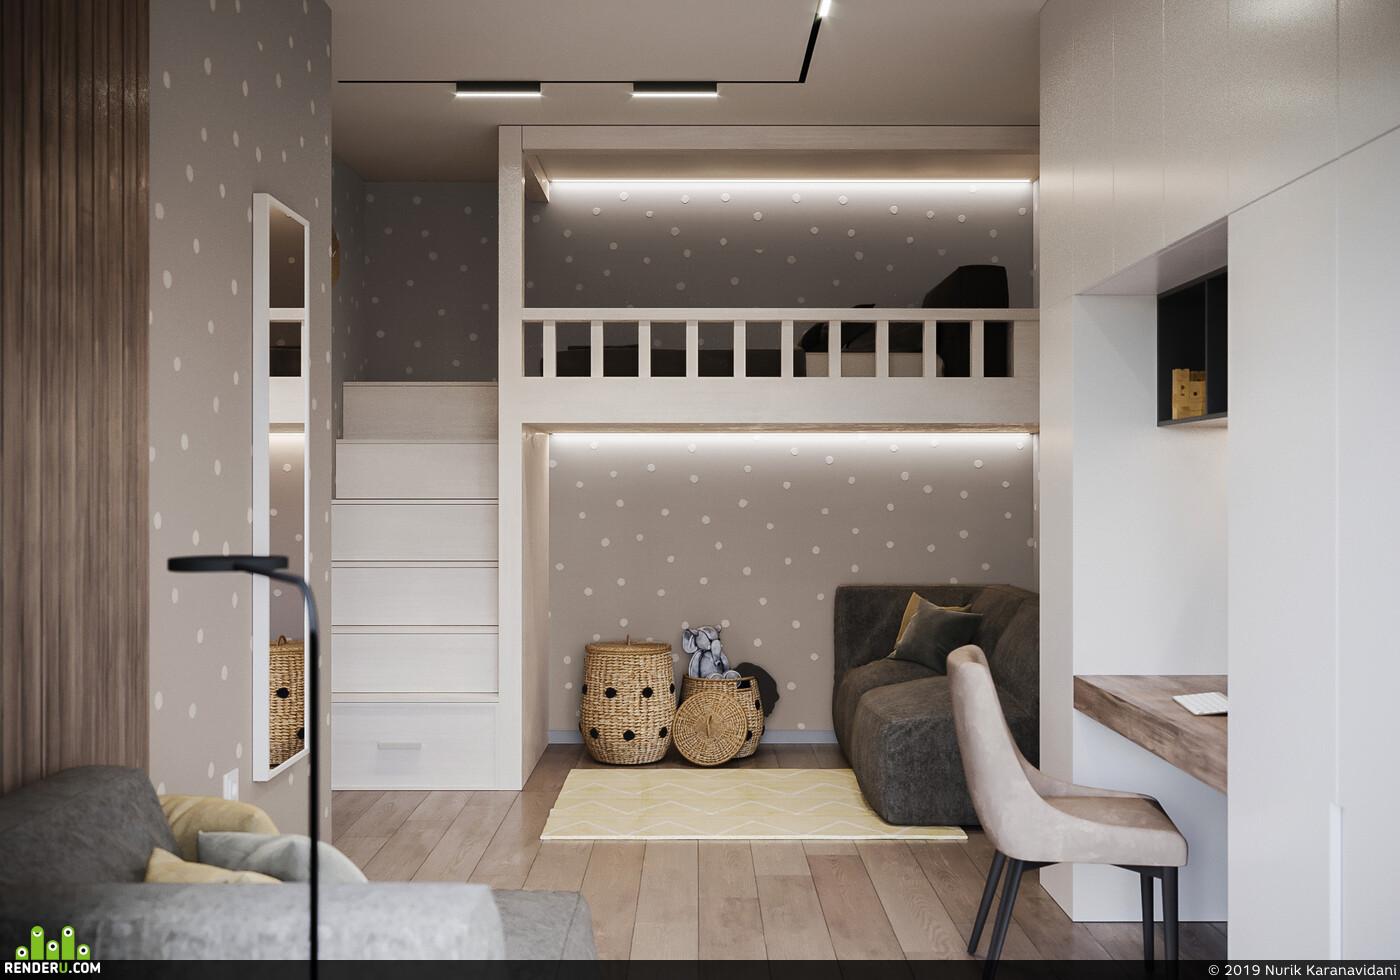 3ds max, Corona Renderer, corona 1.7, interior, interior design, archviz, vizlinestudio, viz, 3dviz